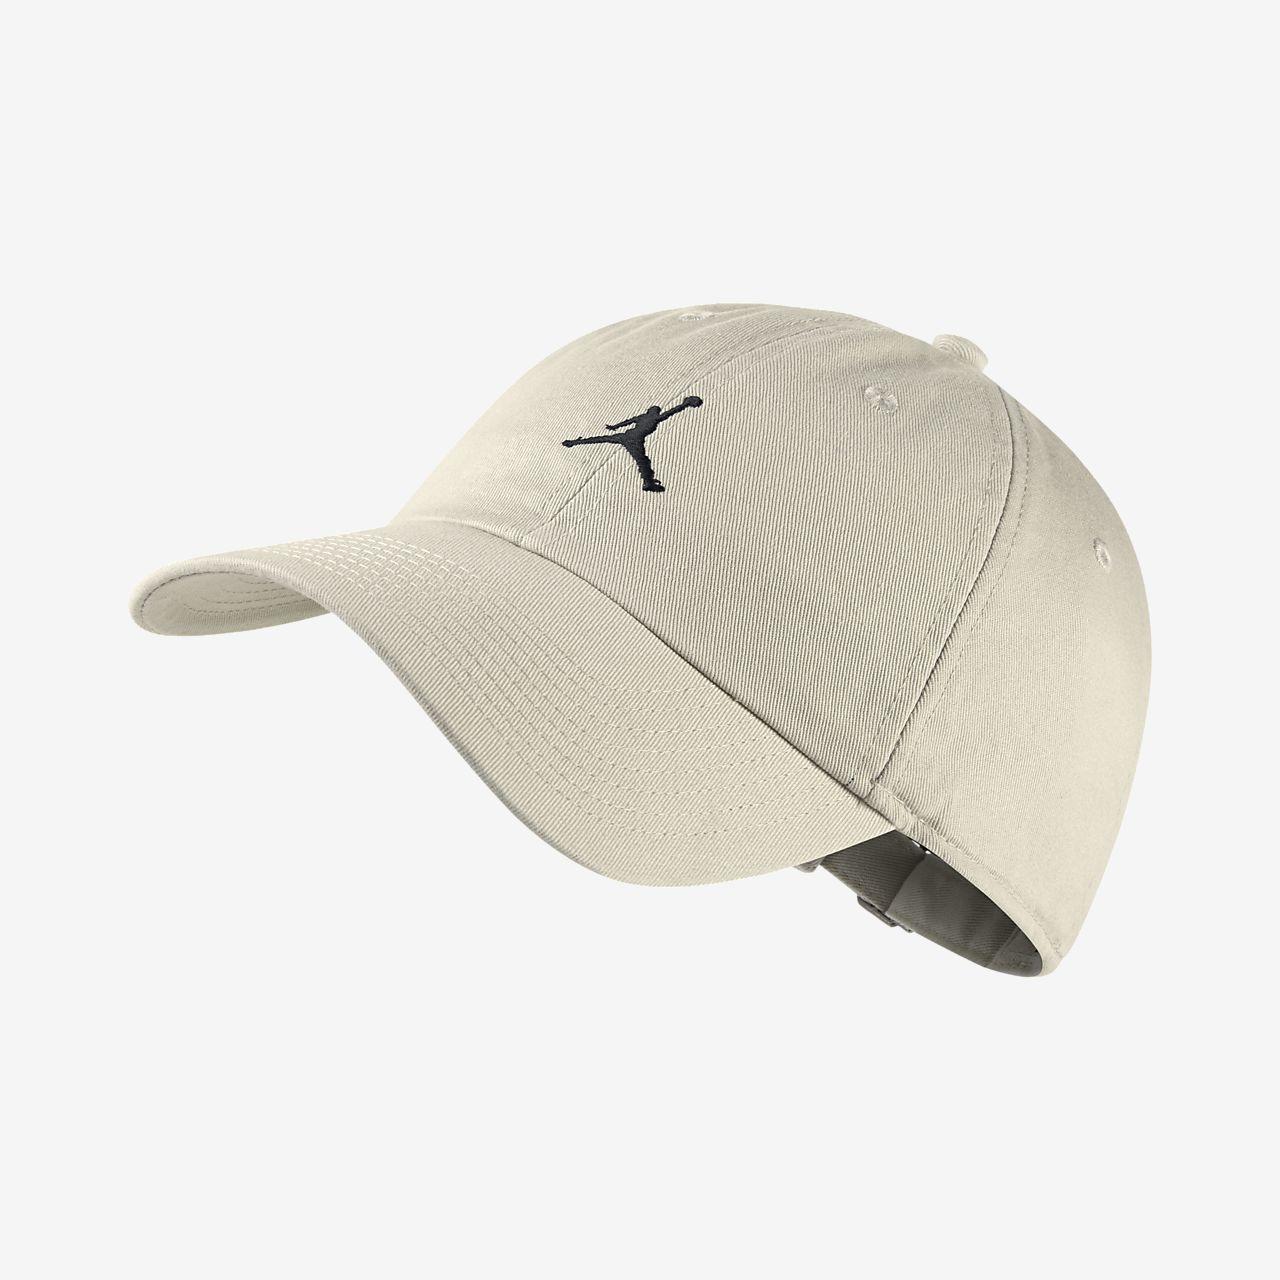 8401a15467d Jordan Jumpman Heritage 86 Adjustable Hat. Nike.com GB